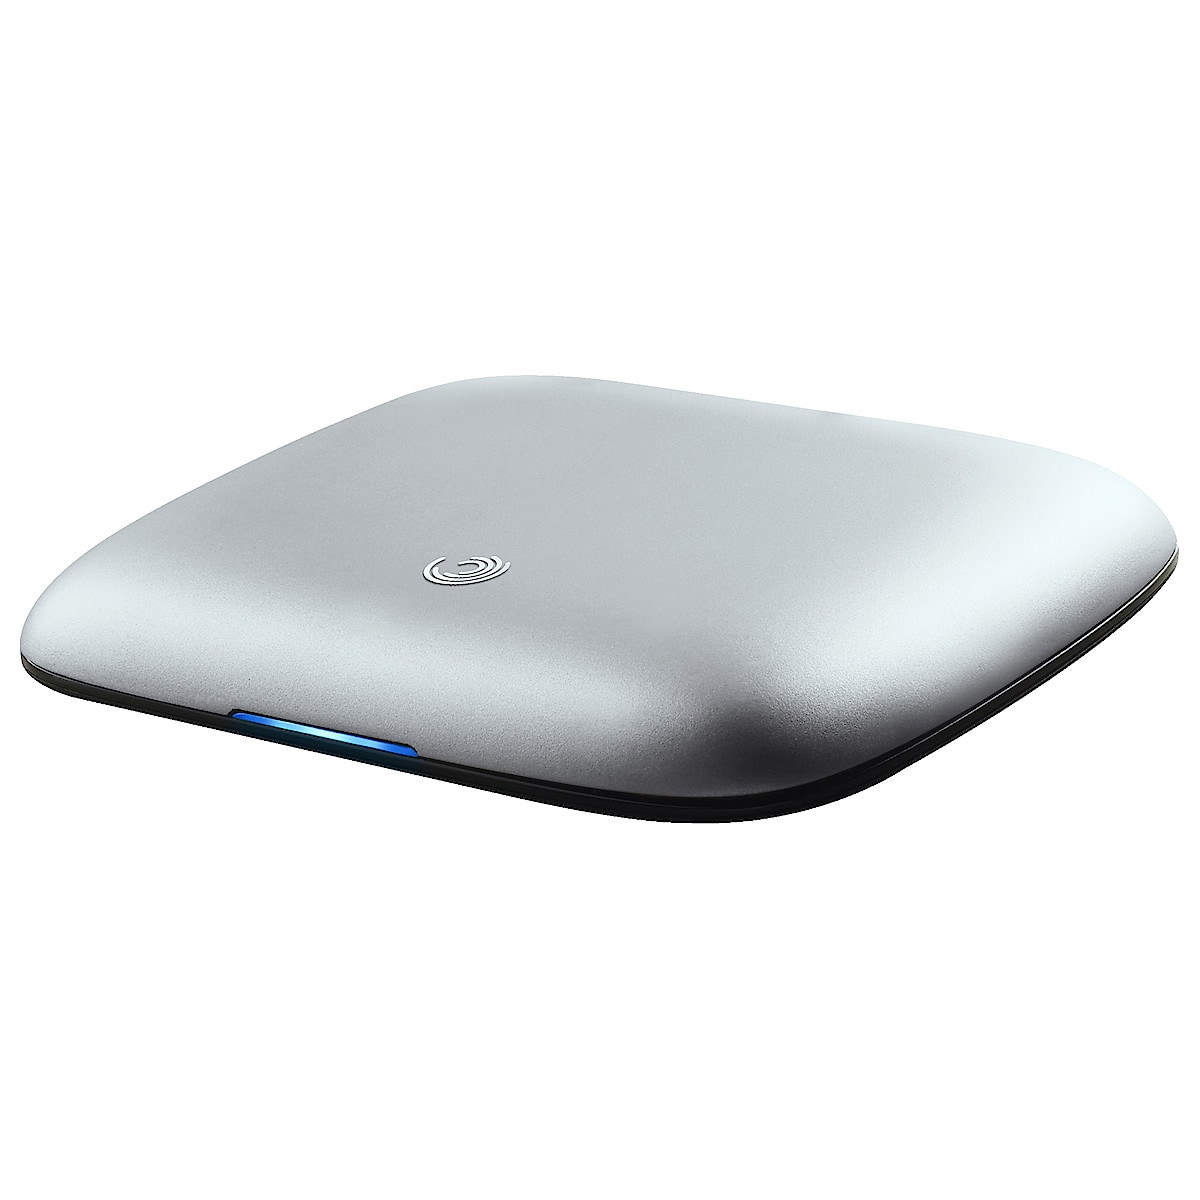 Ekstern harddisk, Seagate Replica 250 GB